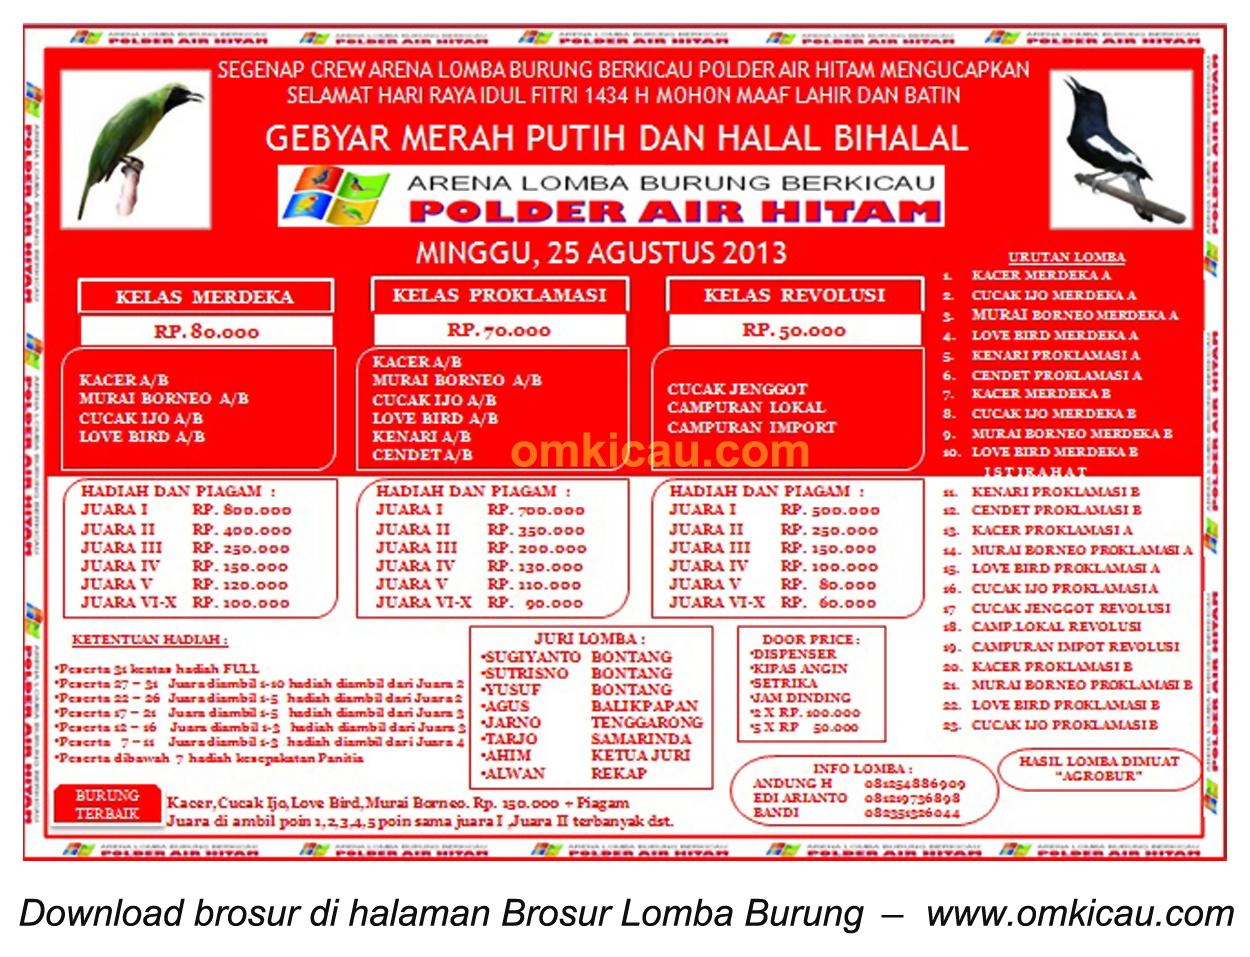 Brosur Lomba Gebyar Merah Putih - Halal Bihalal Samarinda, 25 Agustus 2013